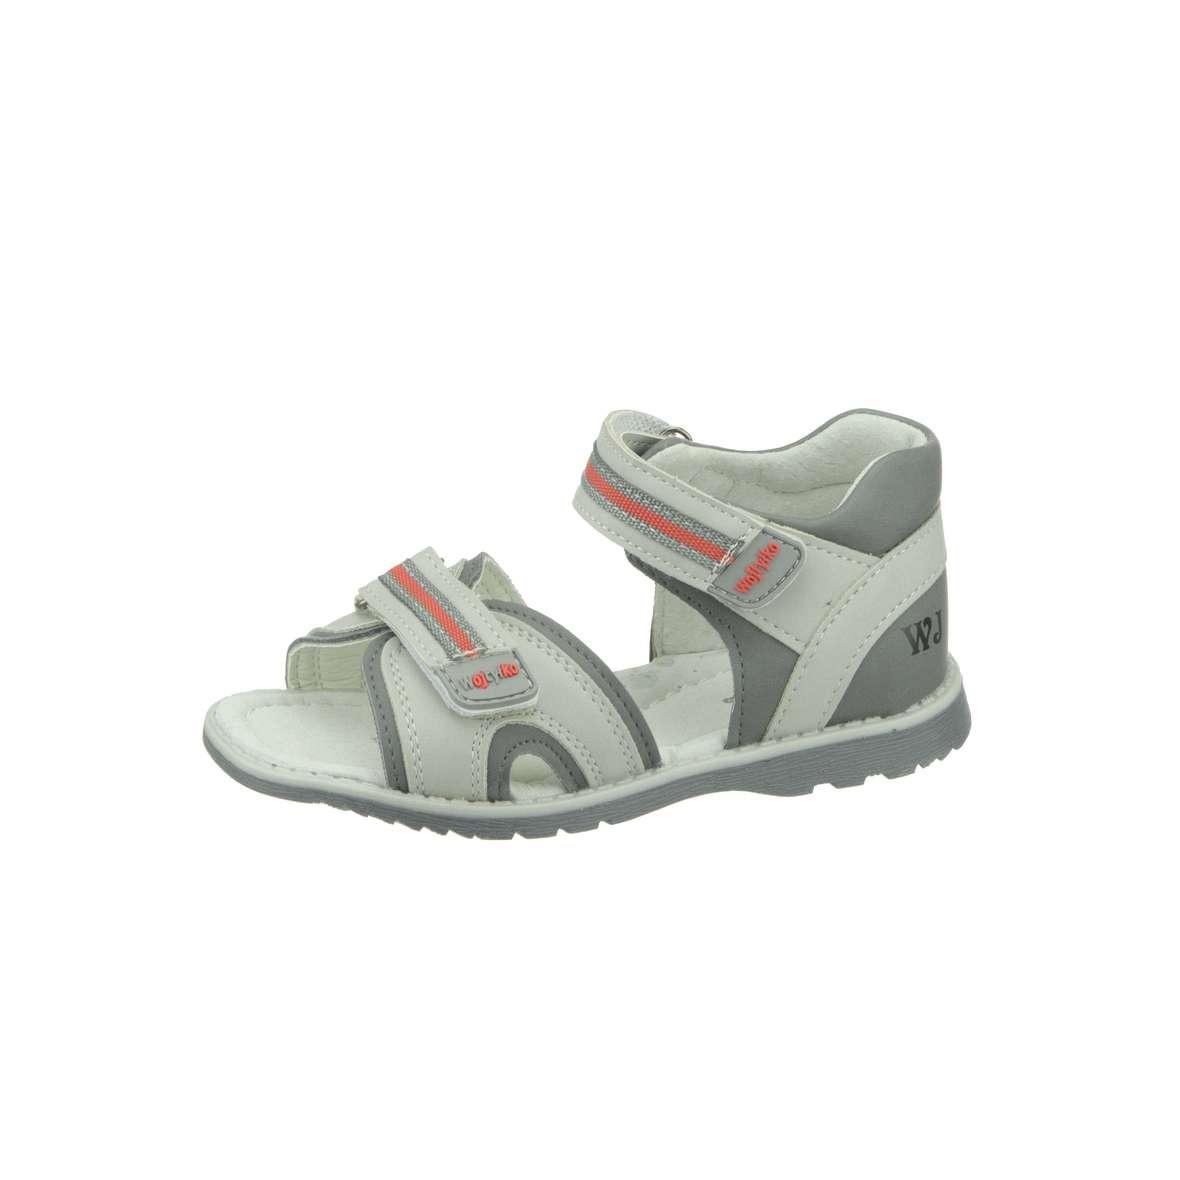 7080c7a8df6 Chlapecká vycházková sandálka AS 3S1258P